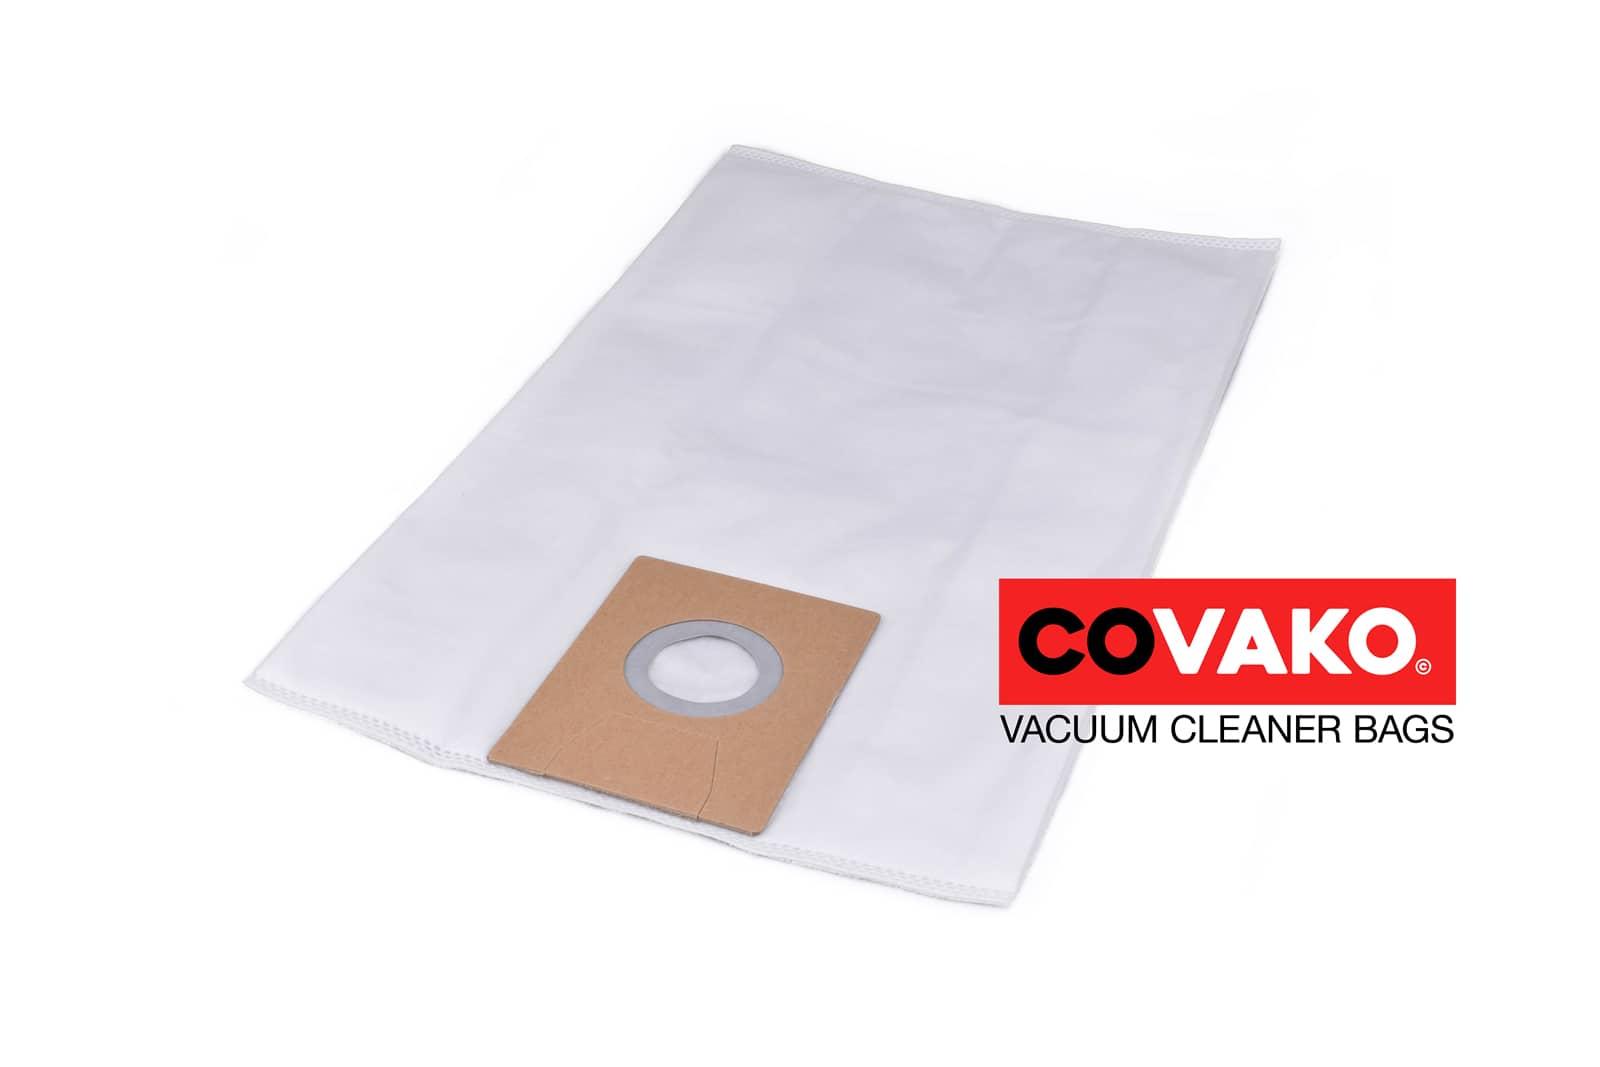 I-vac CA 30 / Synthetisch - I-vac Staubsaugerbeutel